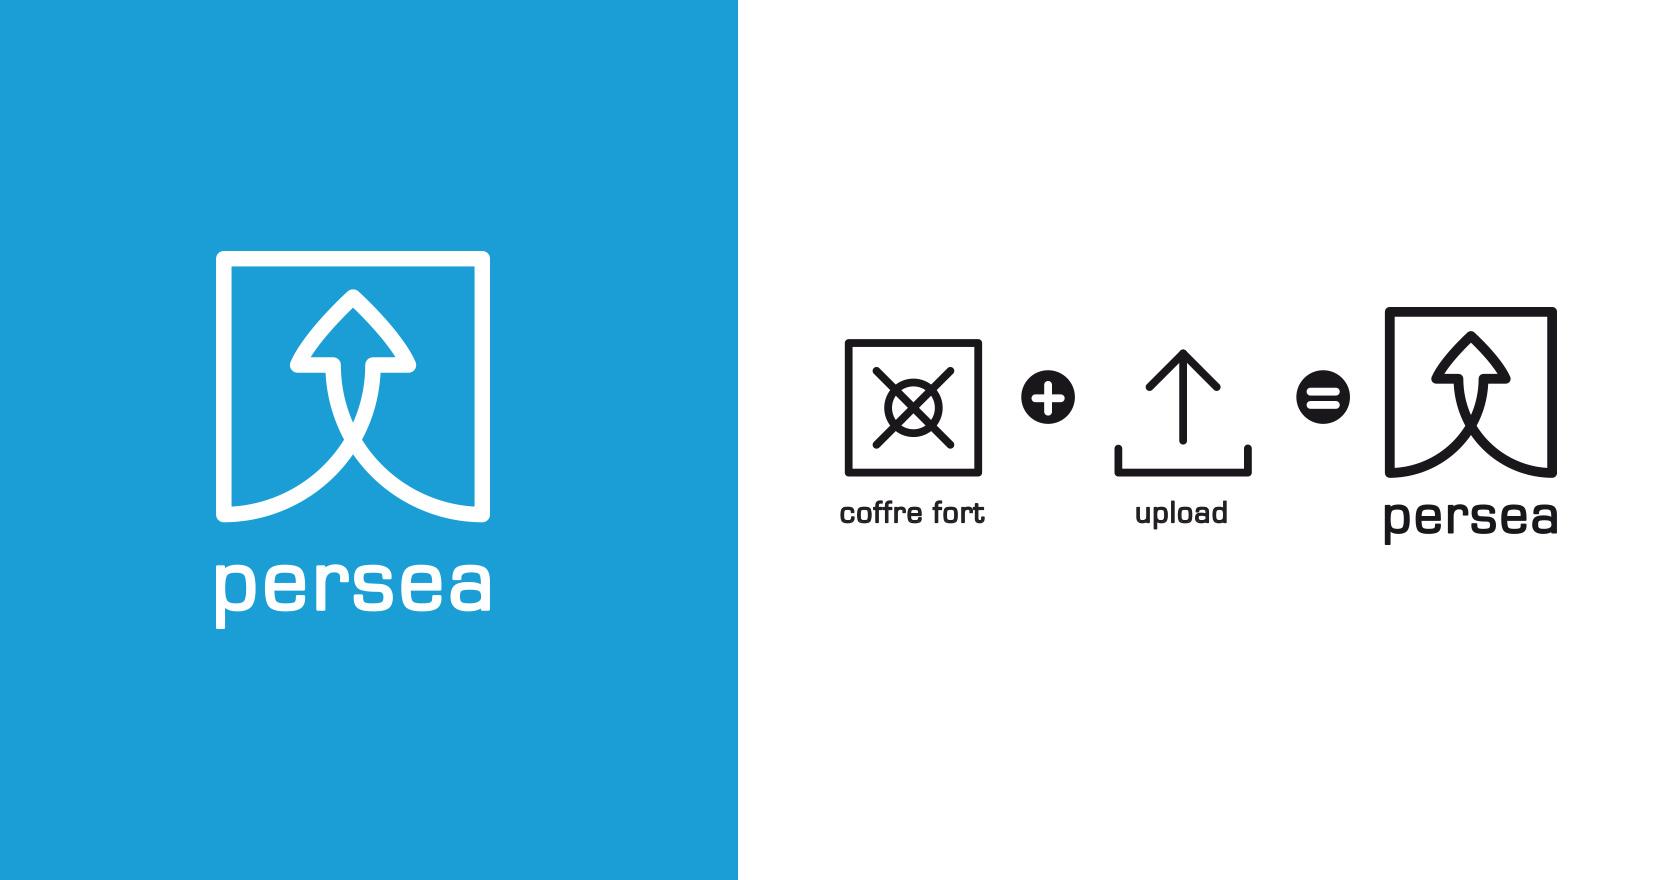 Persea - cloud - logotype - identité visuelle - WALA STUDIO